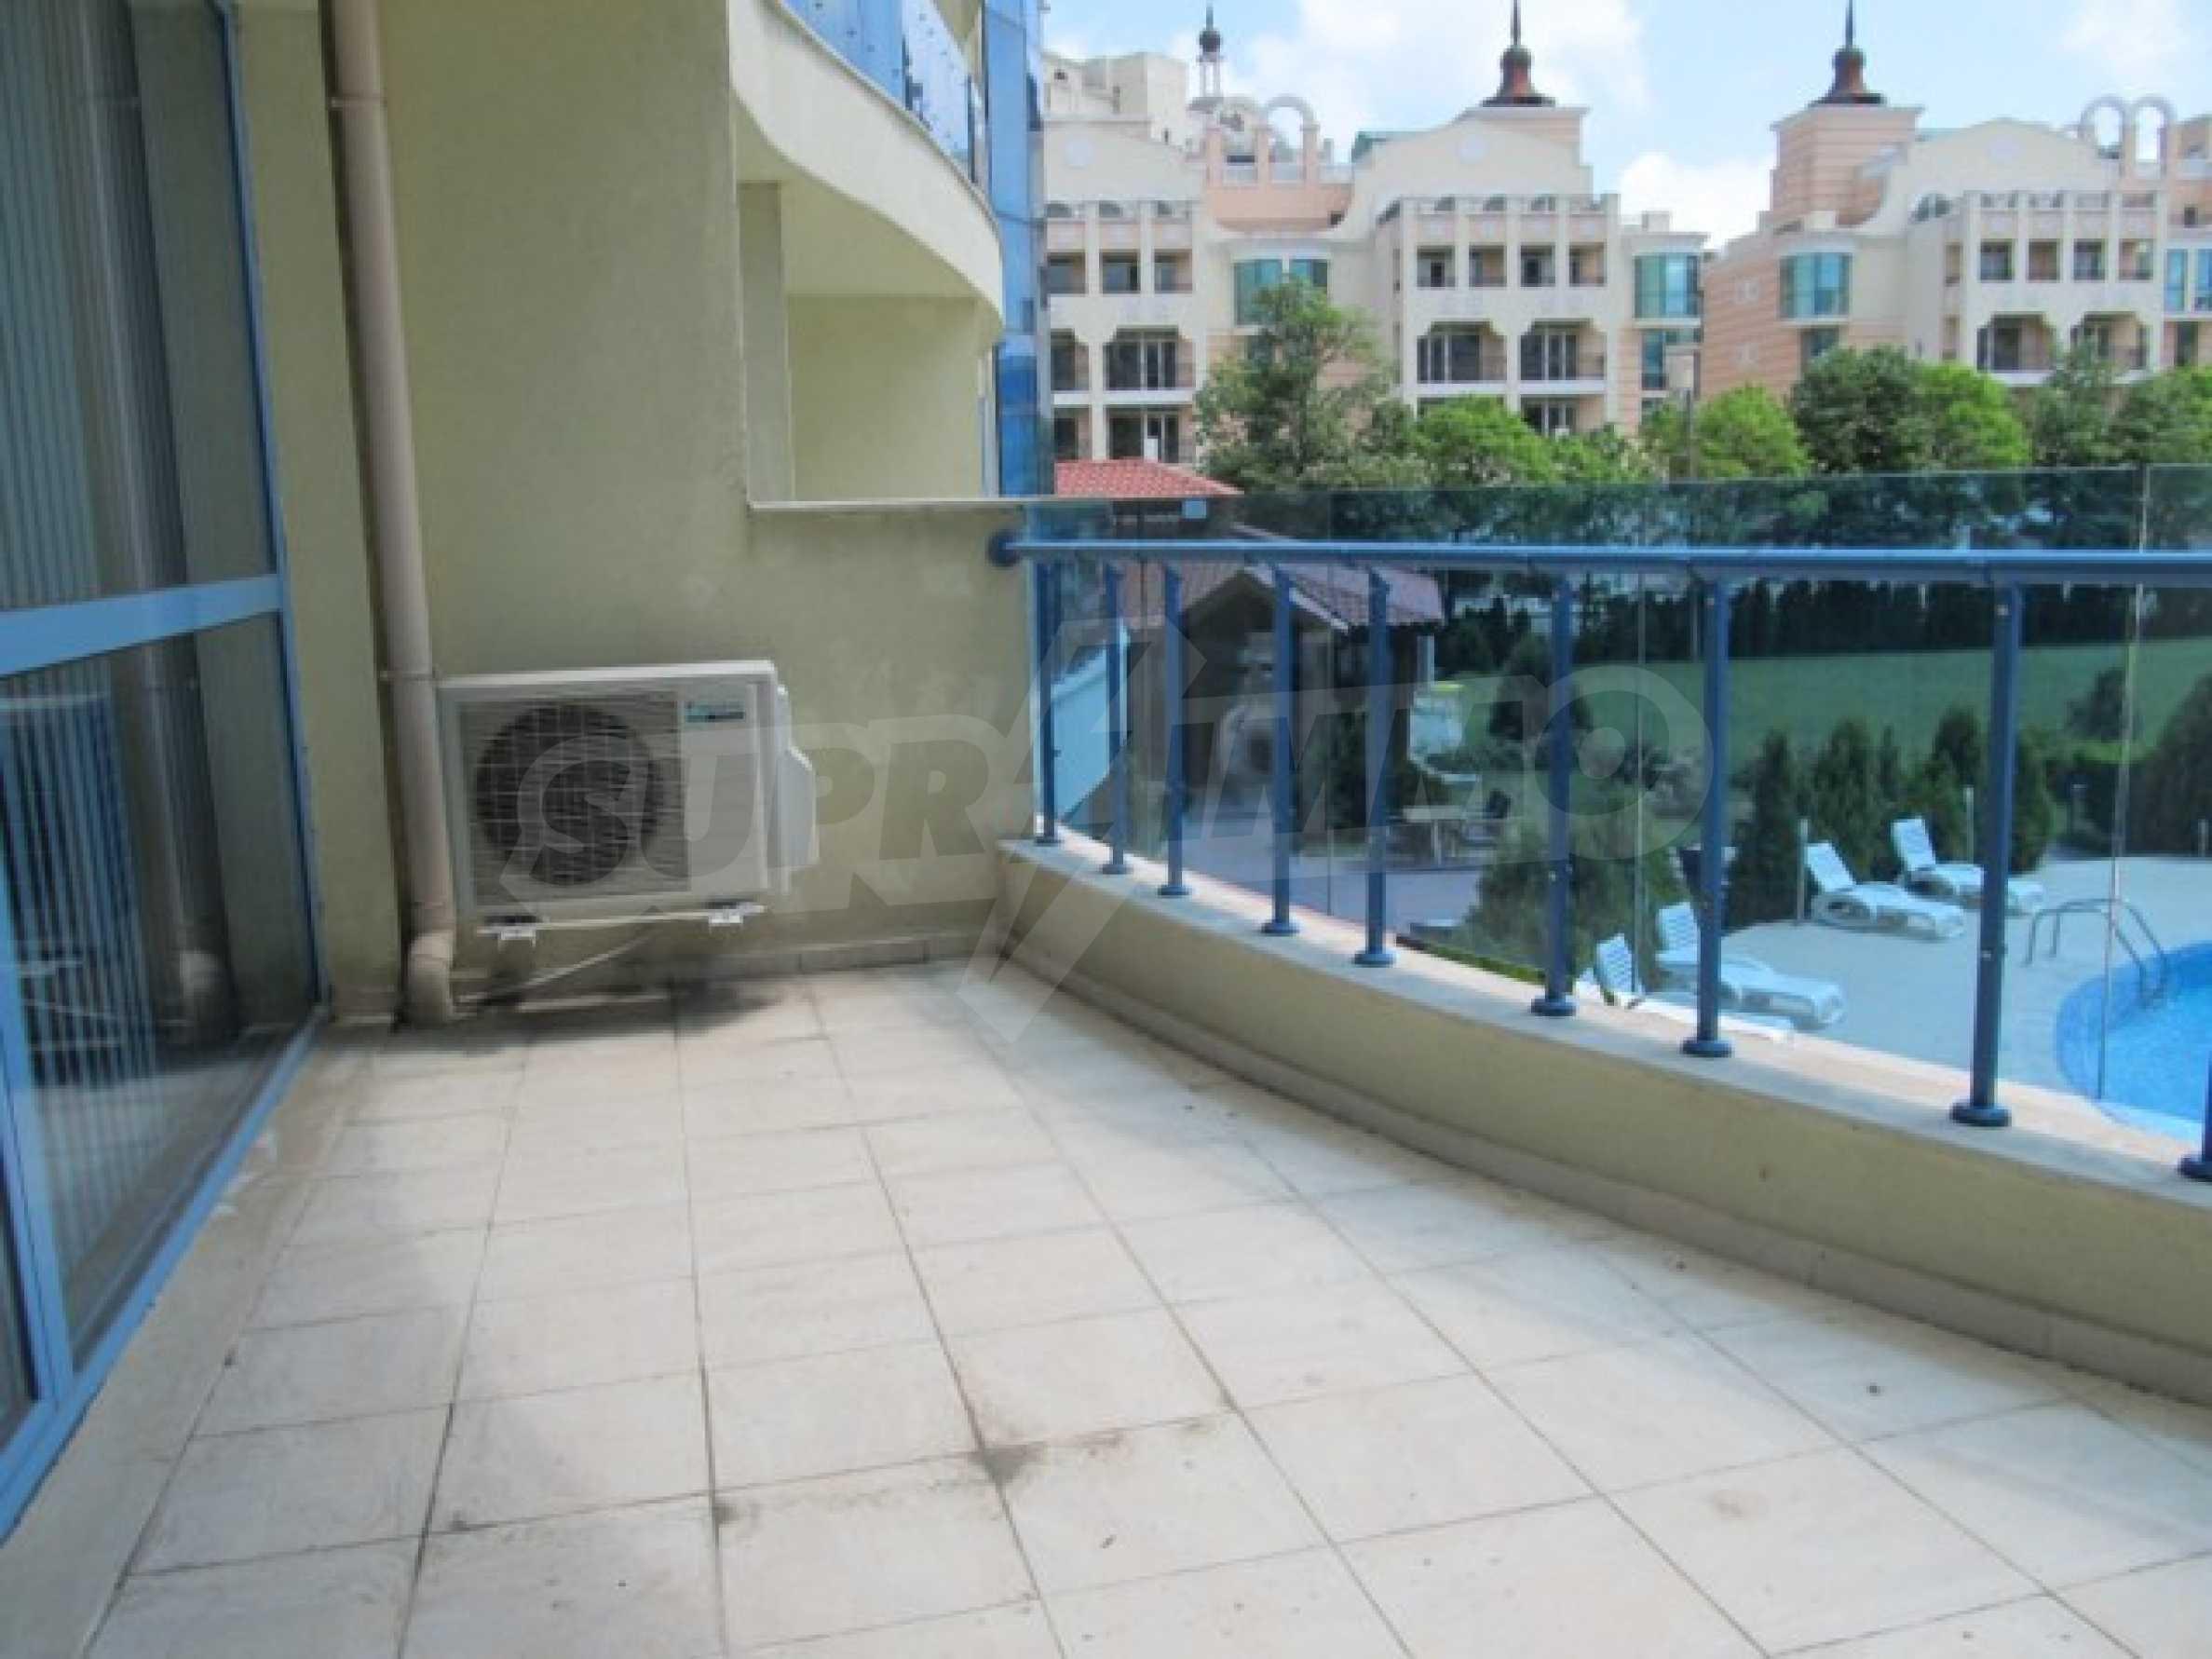 Тристаен апартамент за продажба в Поморие 22